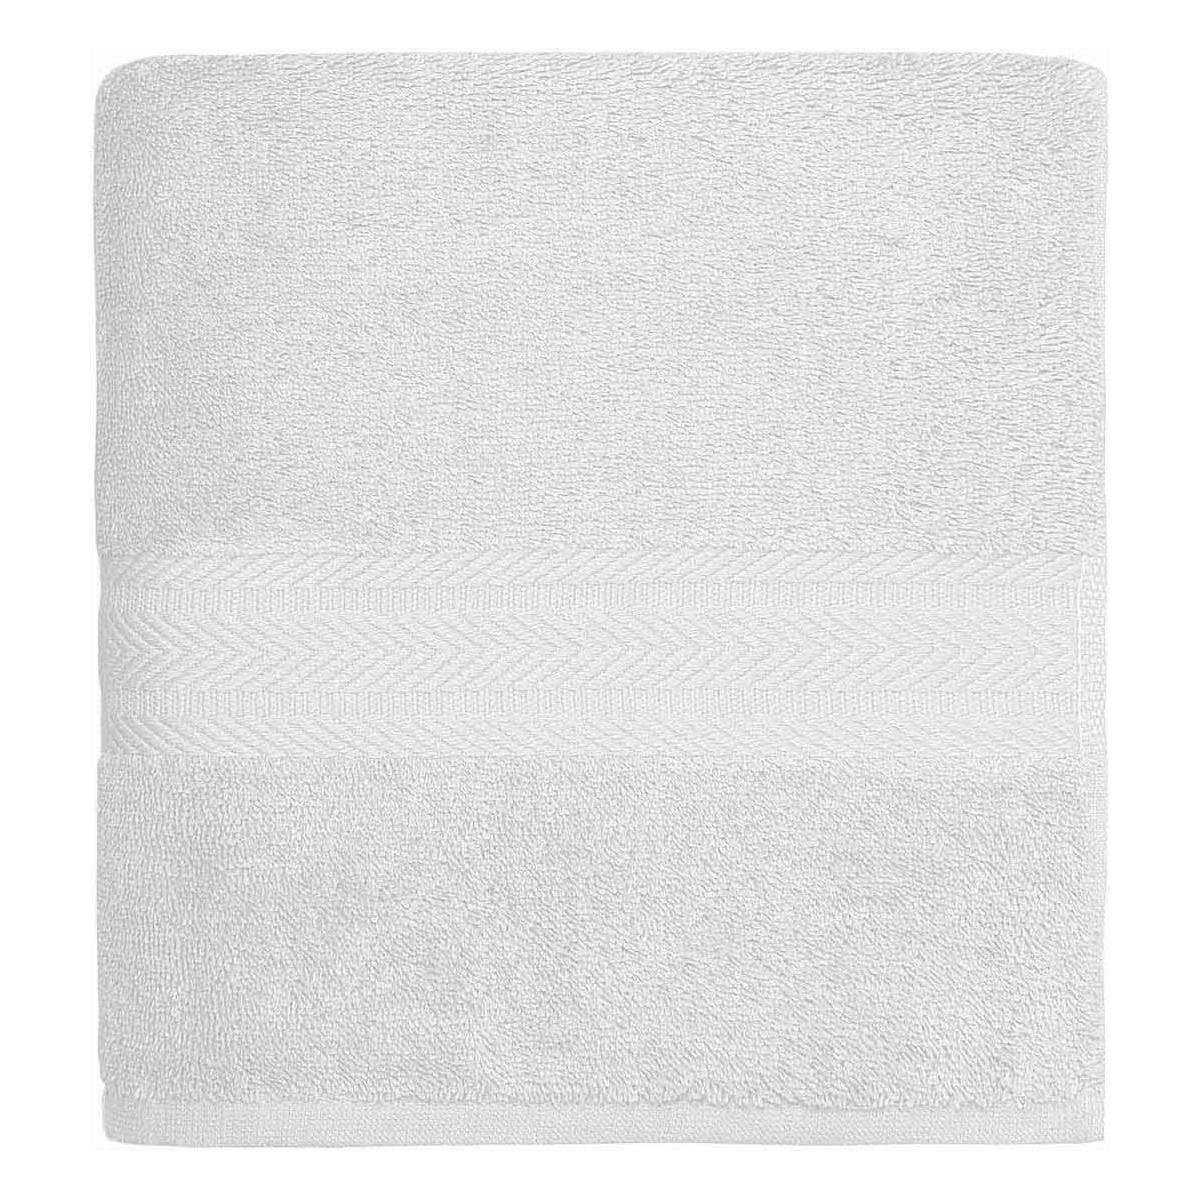 Drap de bain 550gr/m²  Blanc 70x140 cm